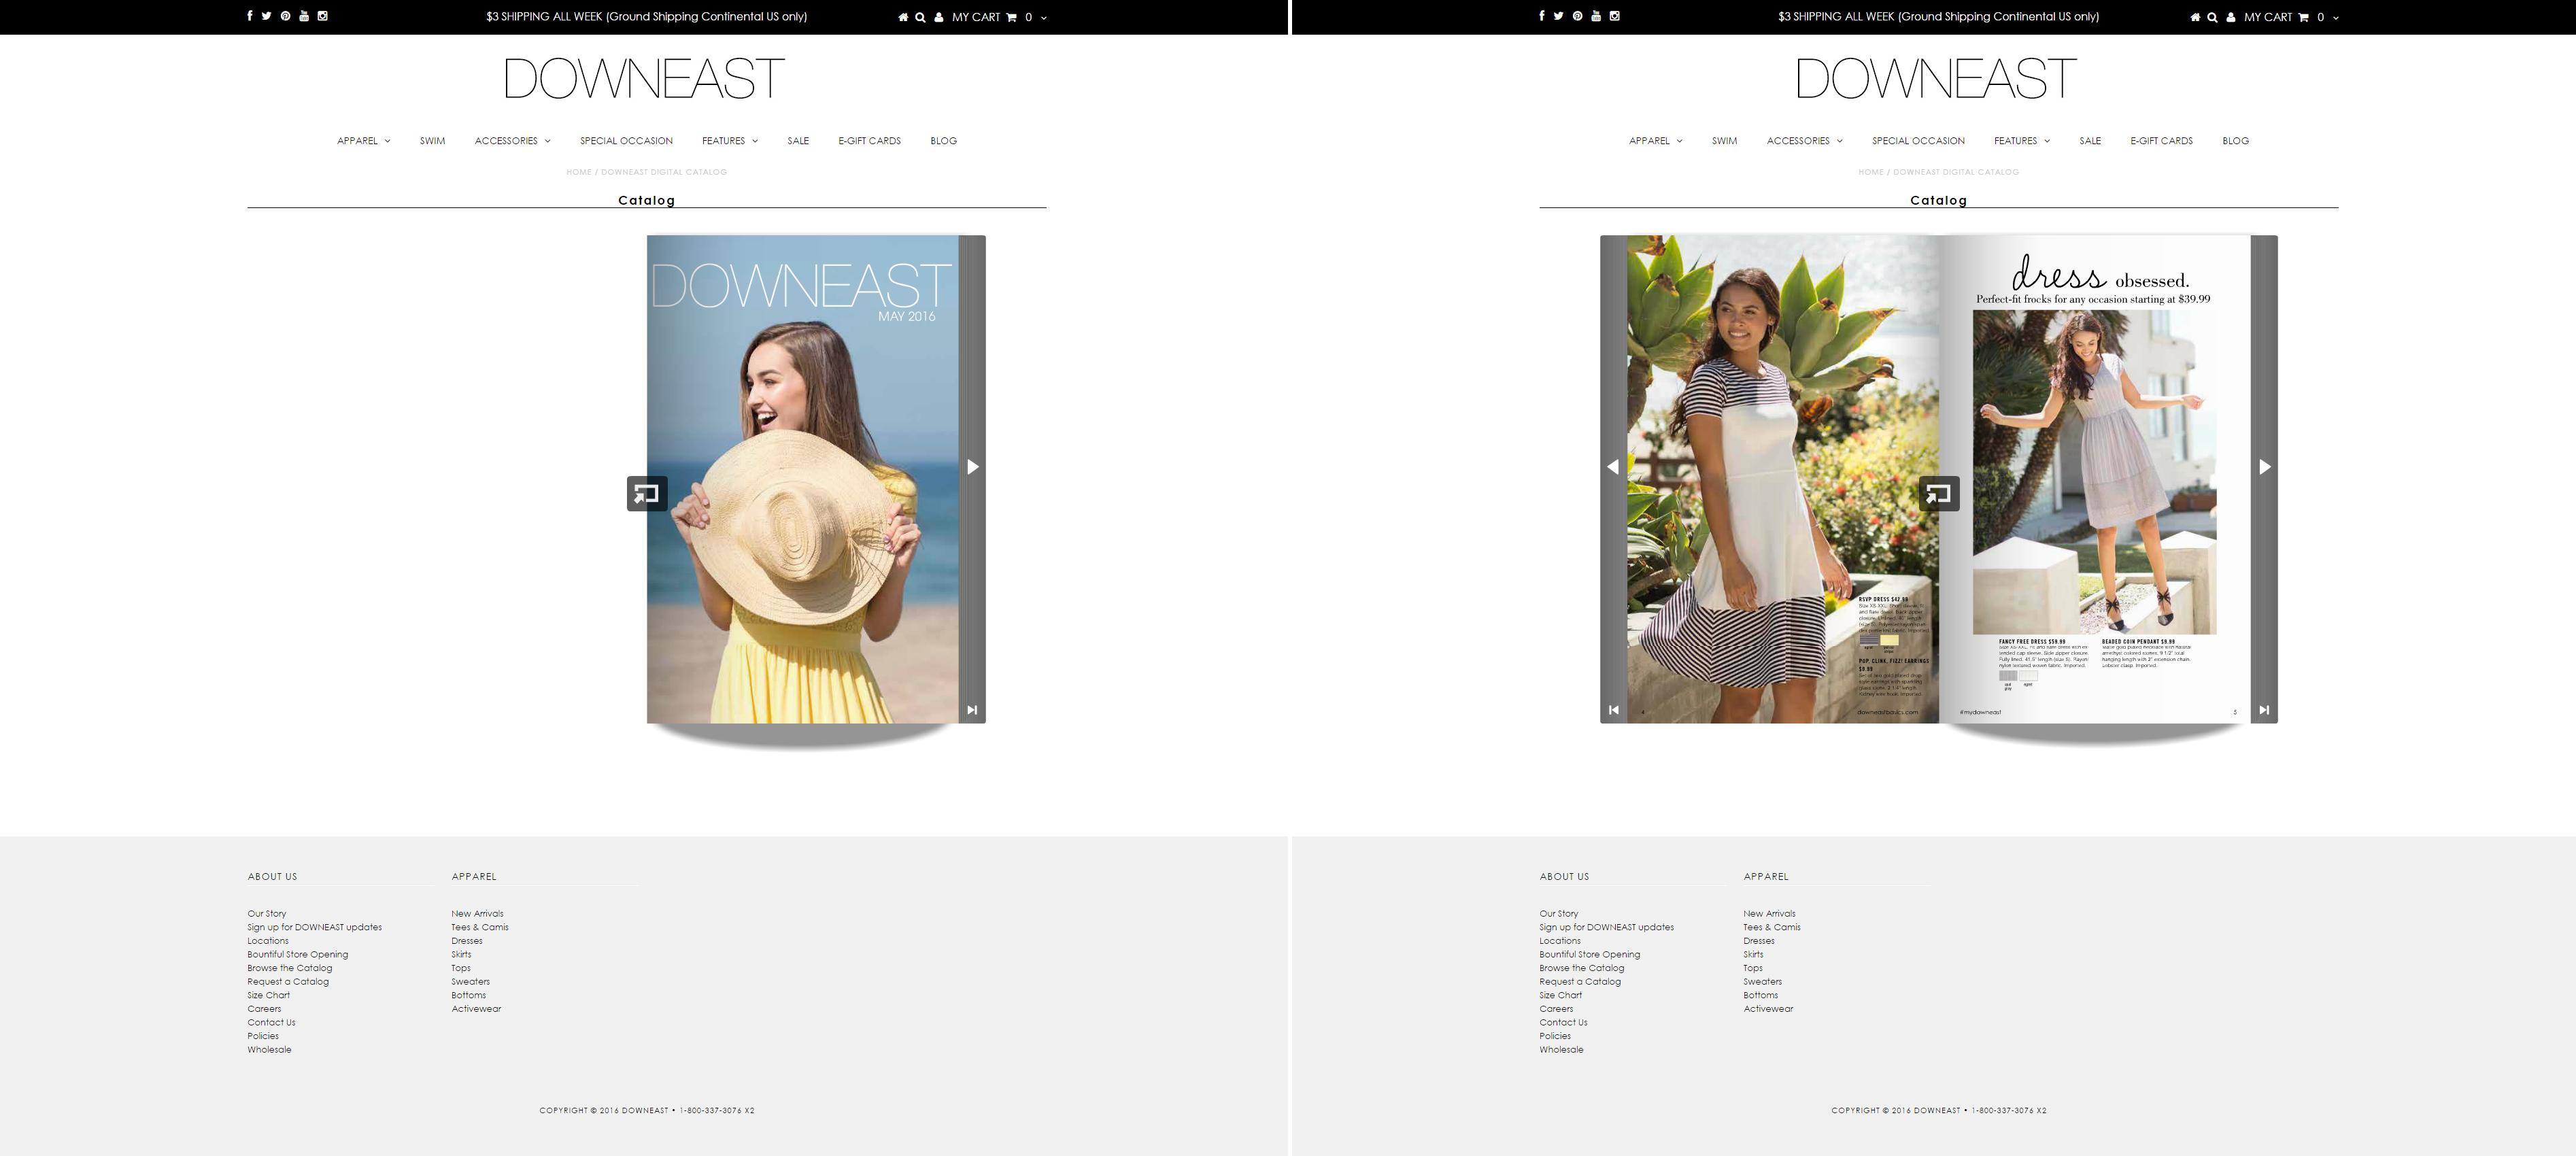 Downeast Digital Catalog – DOWNEAST